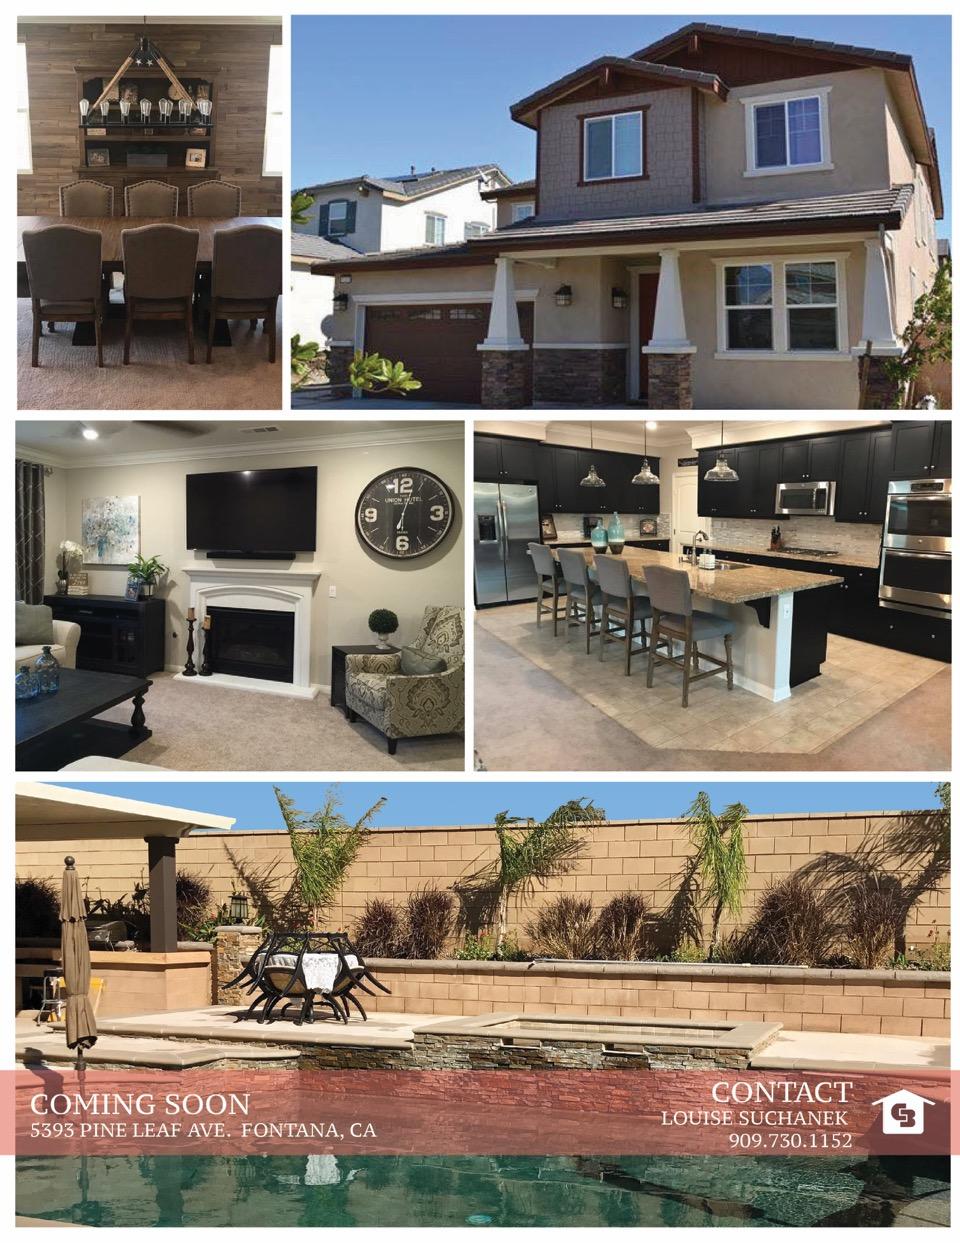 SOLD! 5393 Pine Leaf Ave. Fontana, CA 92336 - Louise Suchanek